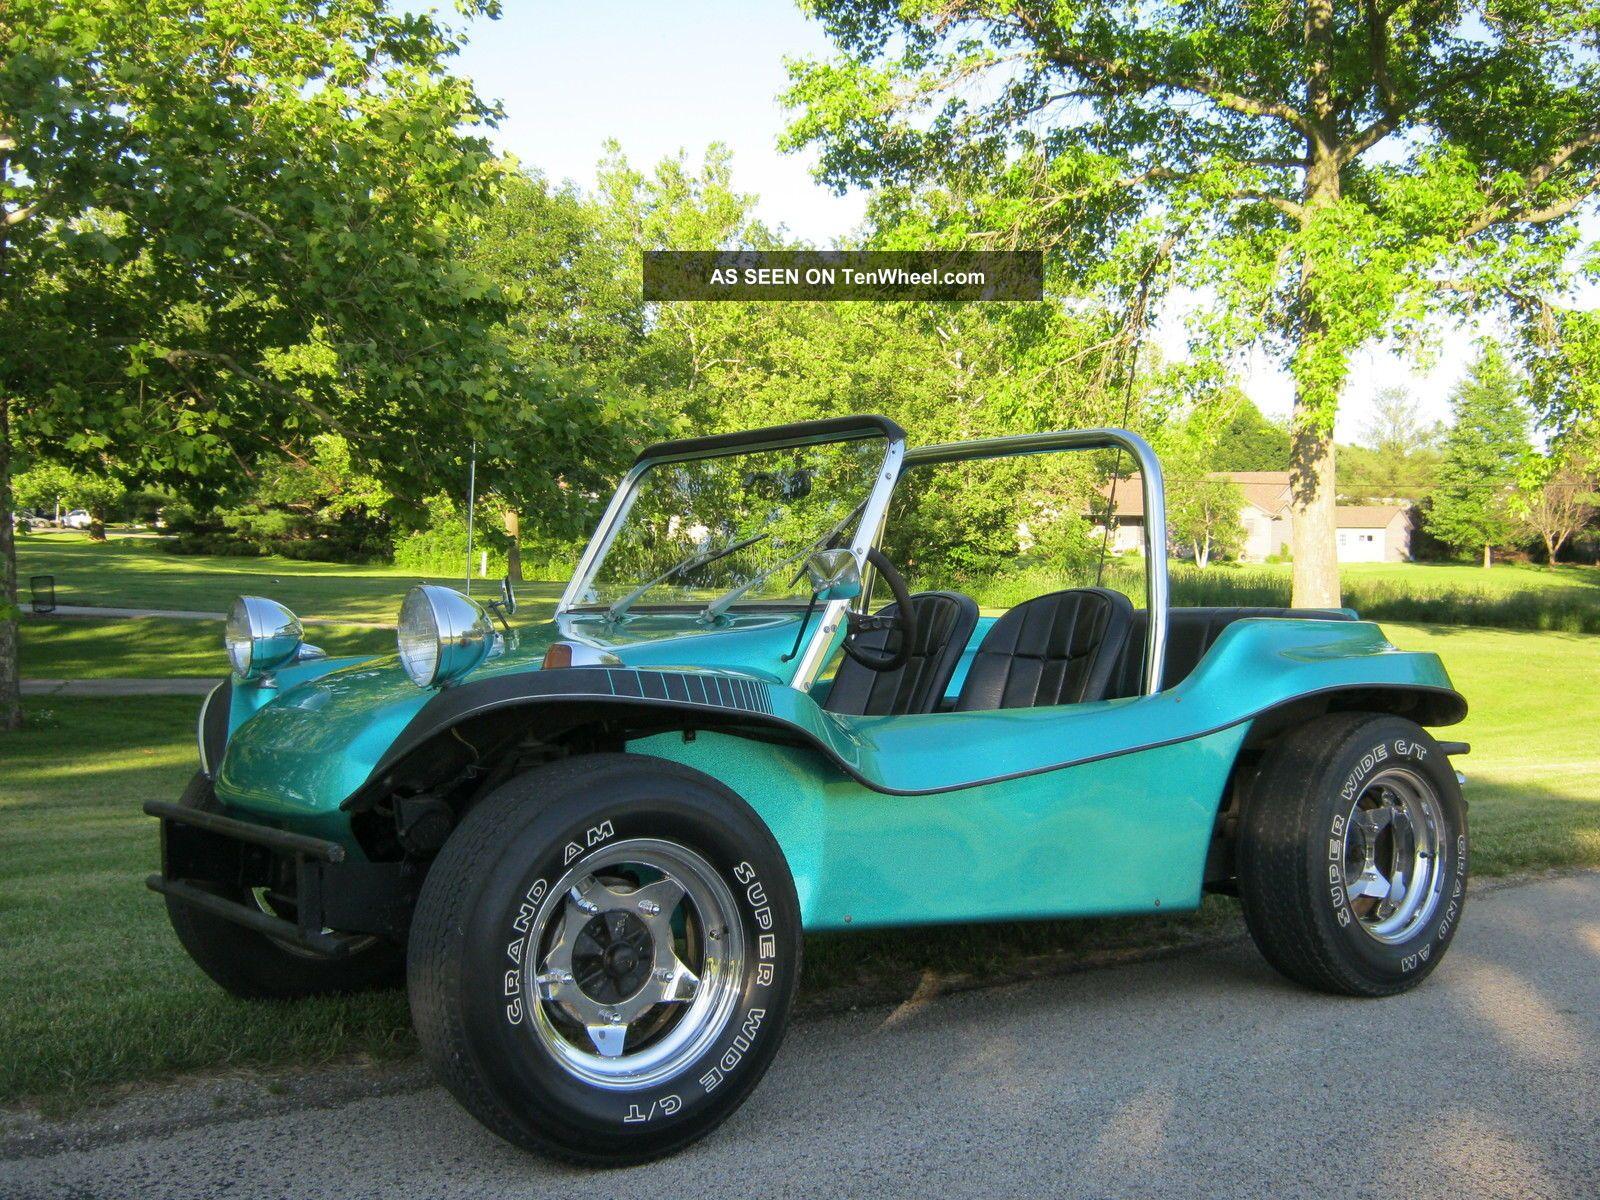 Vw Dune Buggy Buy Mount Mercy University Meyers Manx Wiring Harness 1966 Volkswagen Replica Runs Drives Hardtop Sides